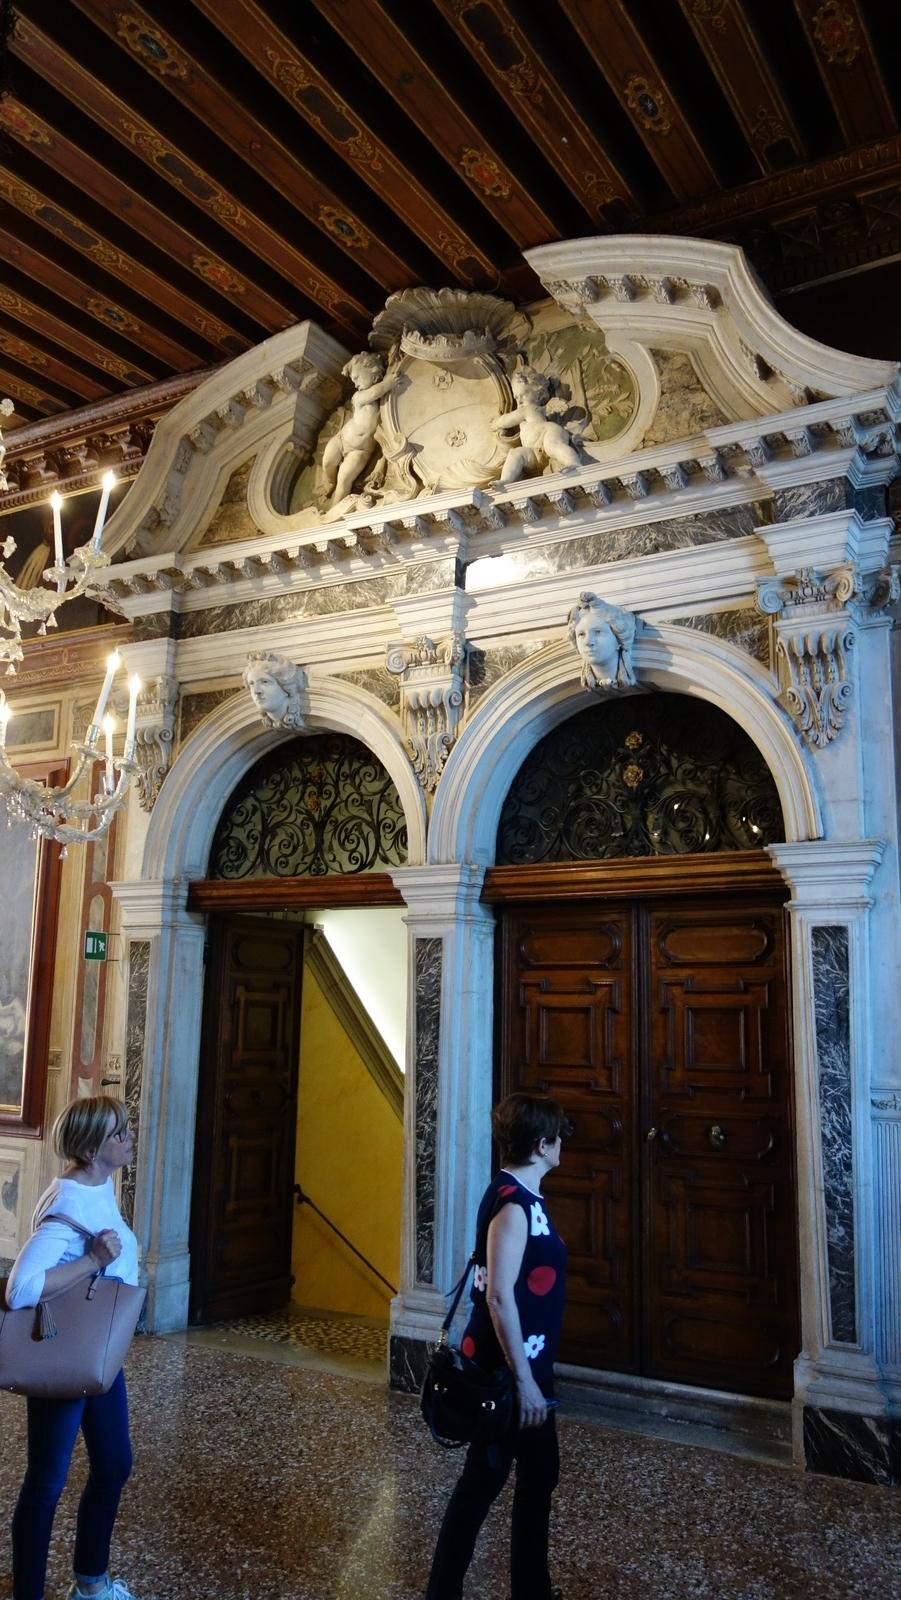 038 - Palazzo Mocenigo